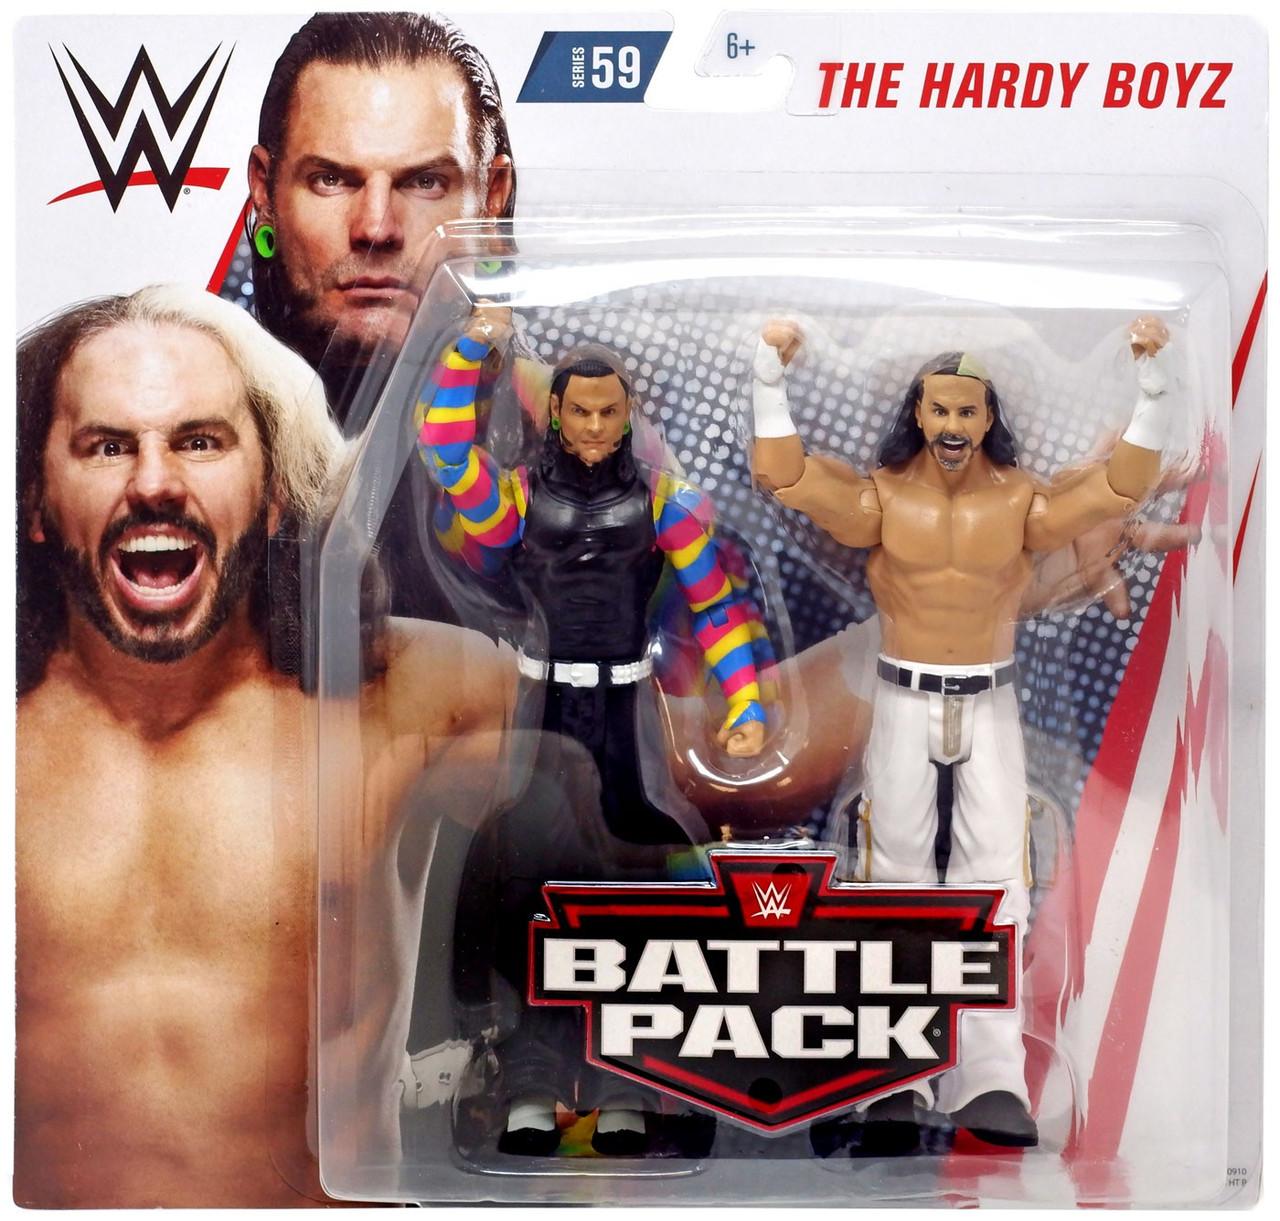 WWE MATTEL BASIC BATTLE PACK WRESTLEMANIA JEFF HARDY WRESTLING FIGURE THE BOYZ